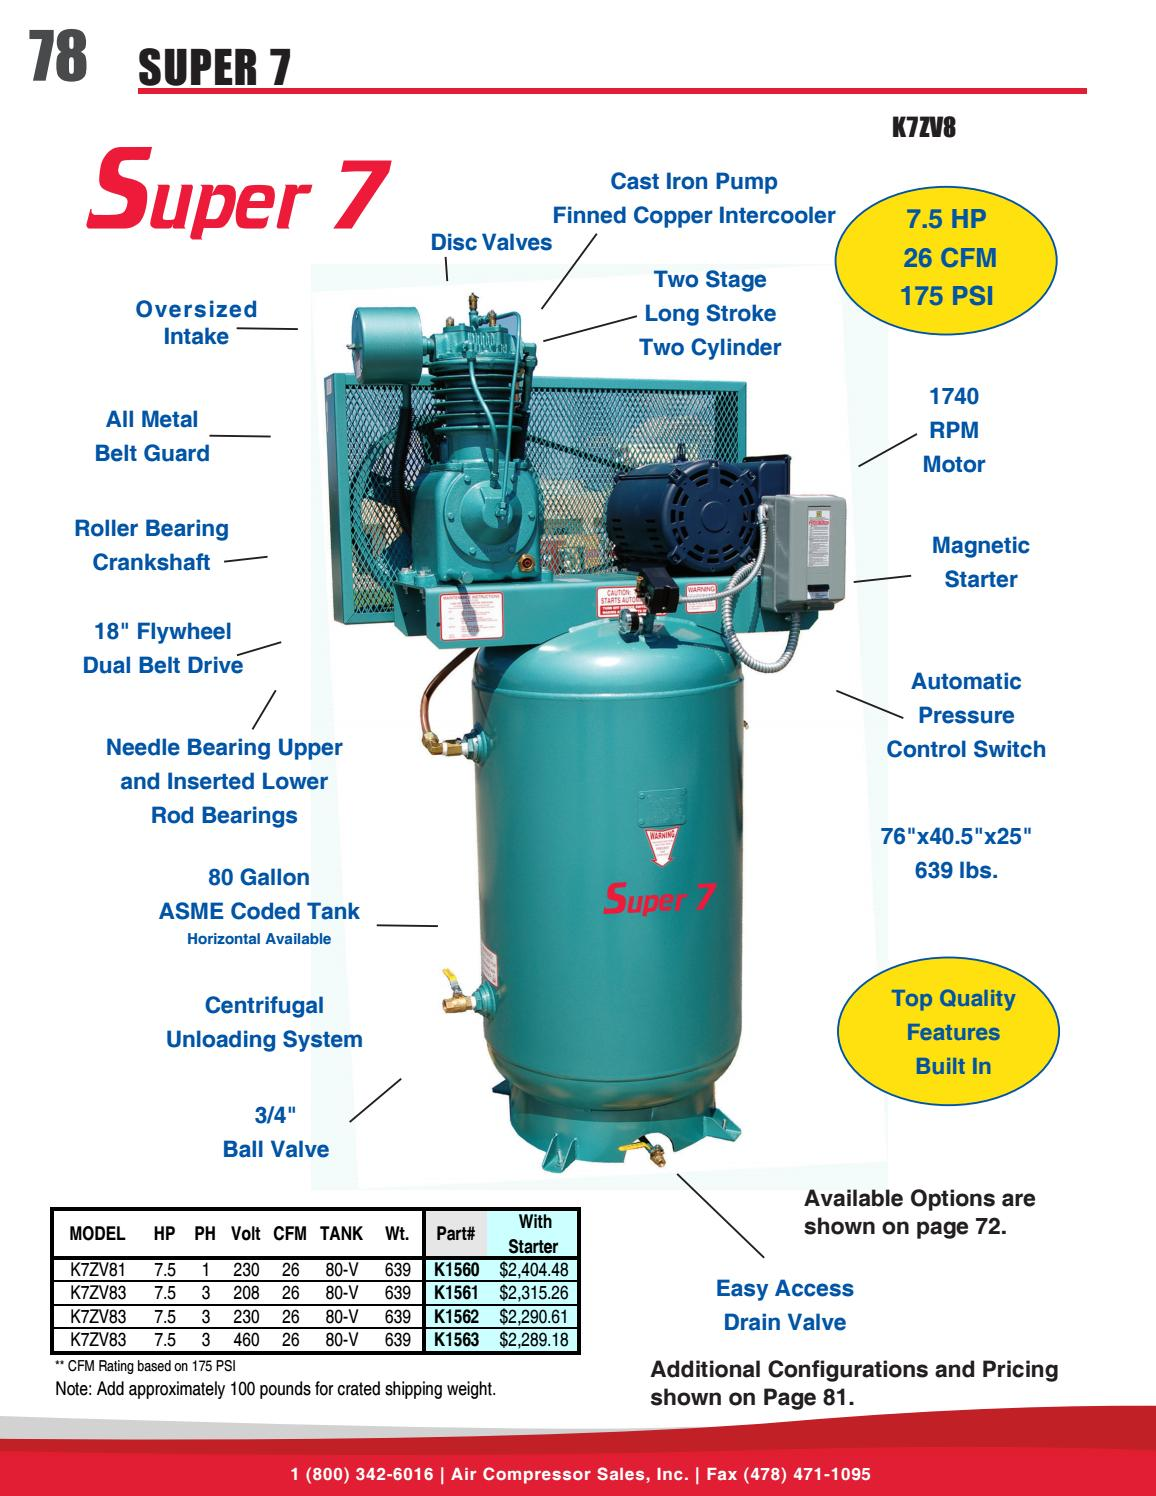 Spring & Summer 2017 Catalog - Air Compressor Sales, Inc  by